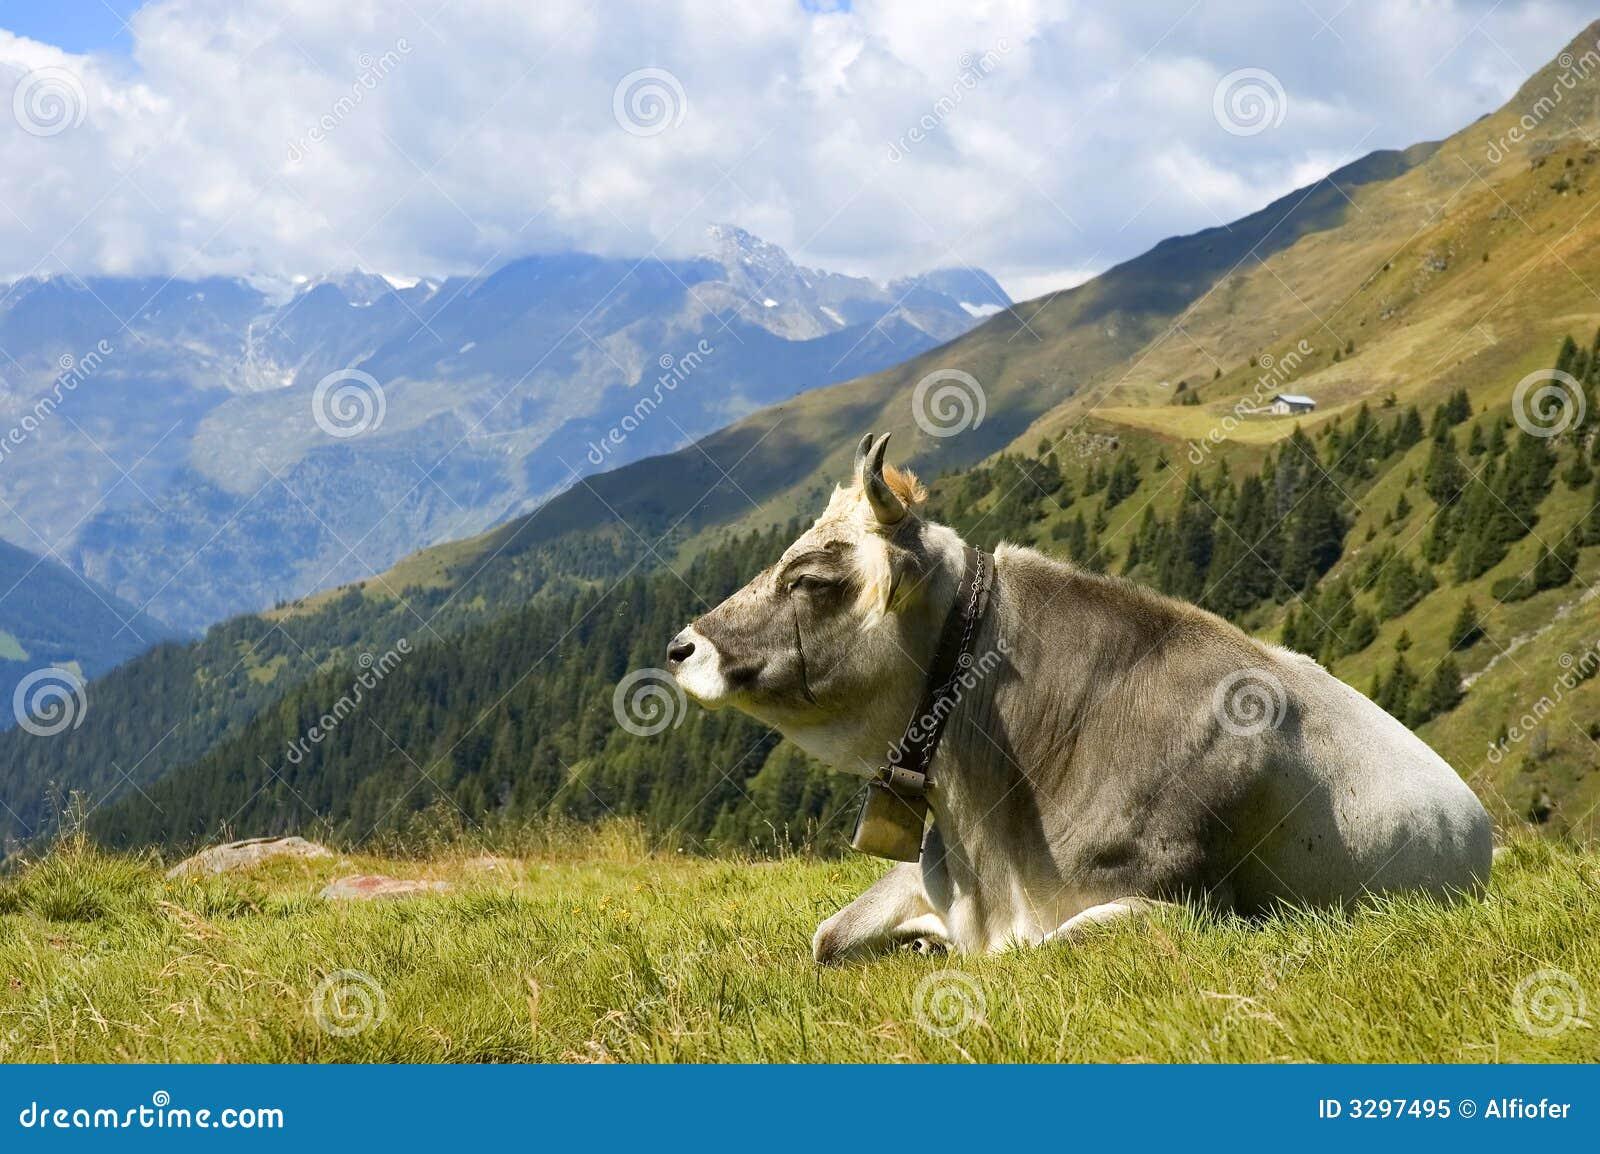 A cow on alp grass